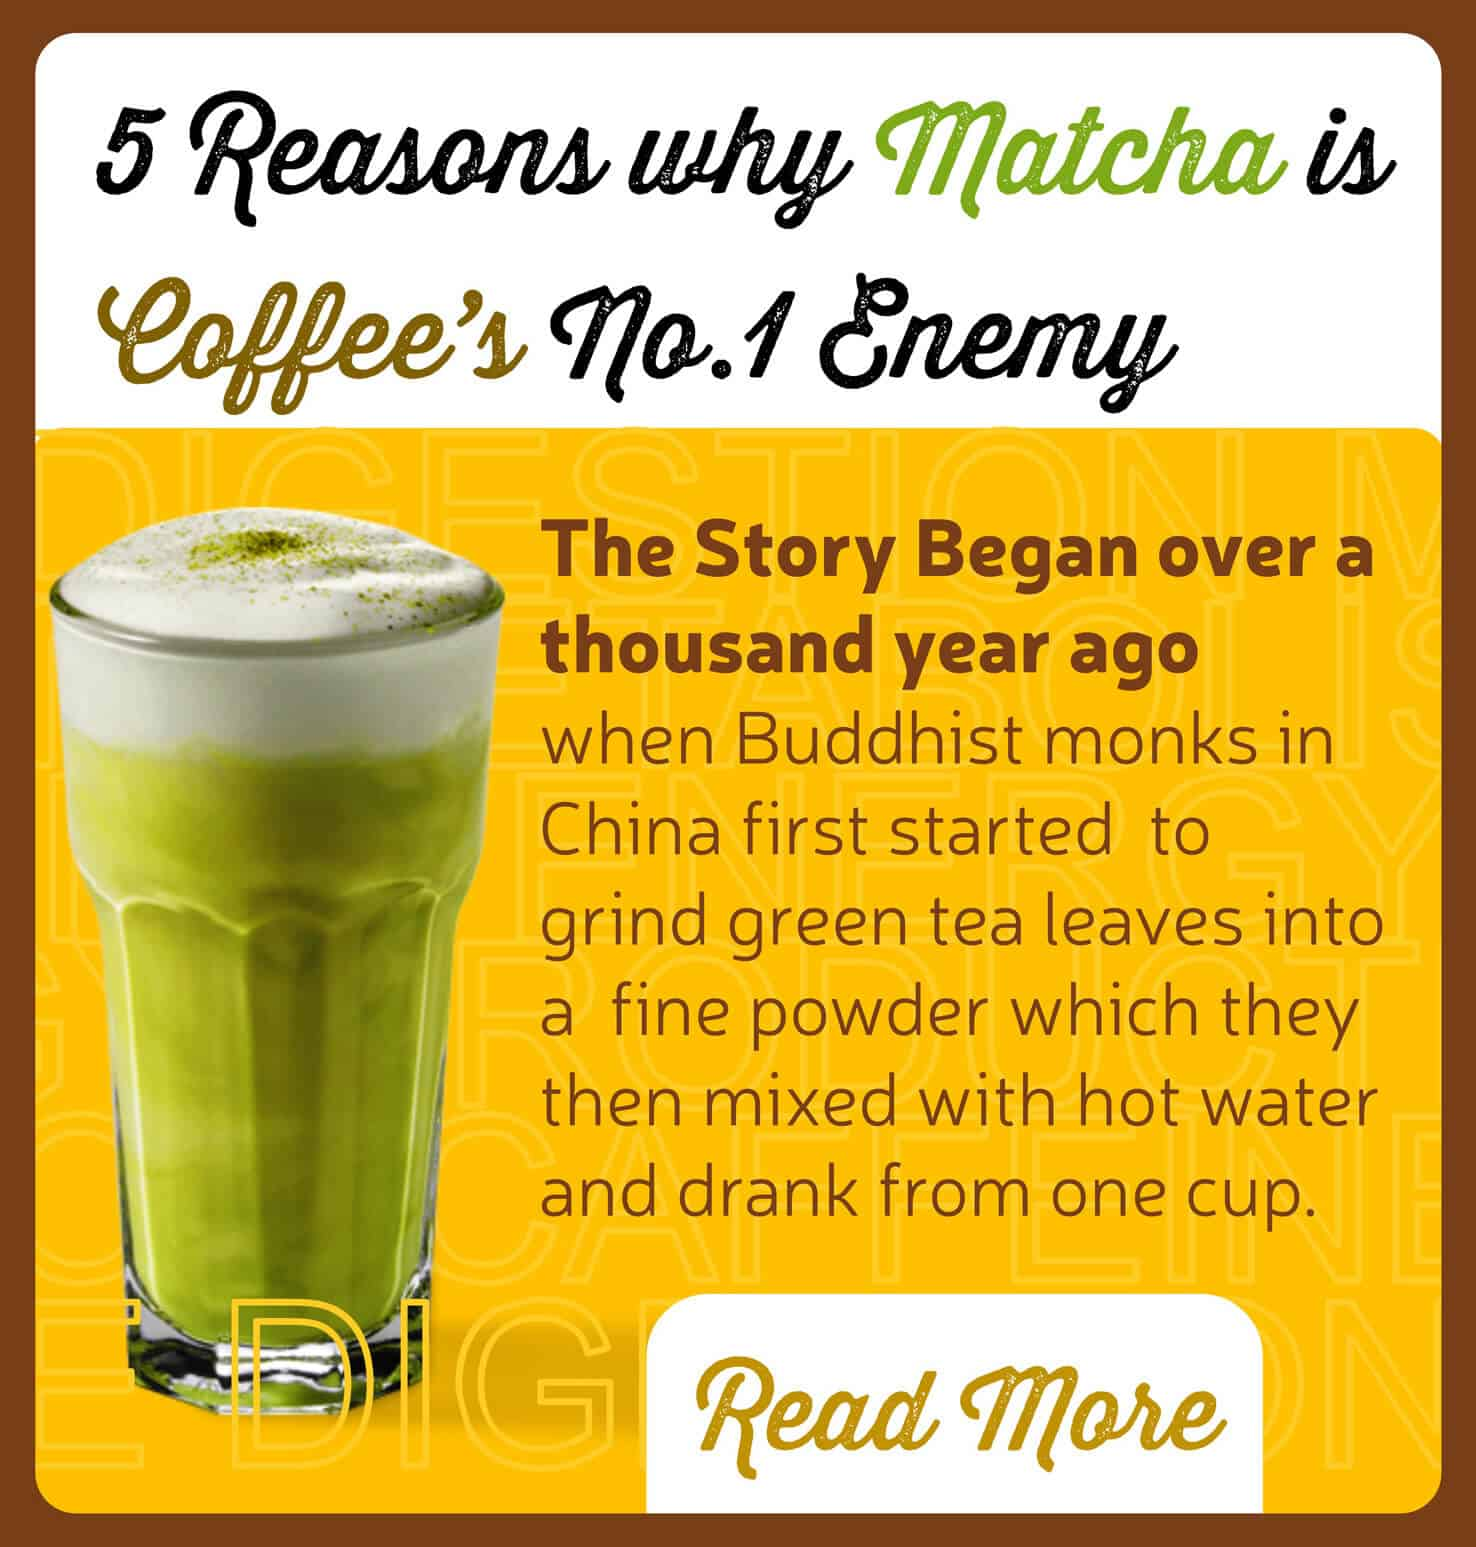 5-Reasons-Matcha